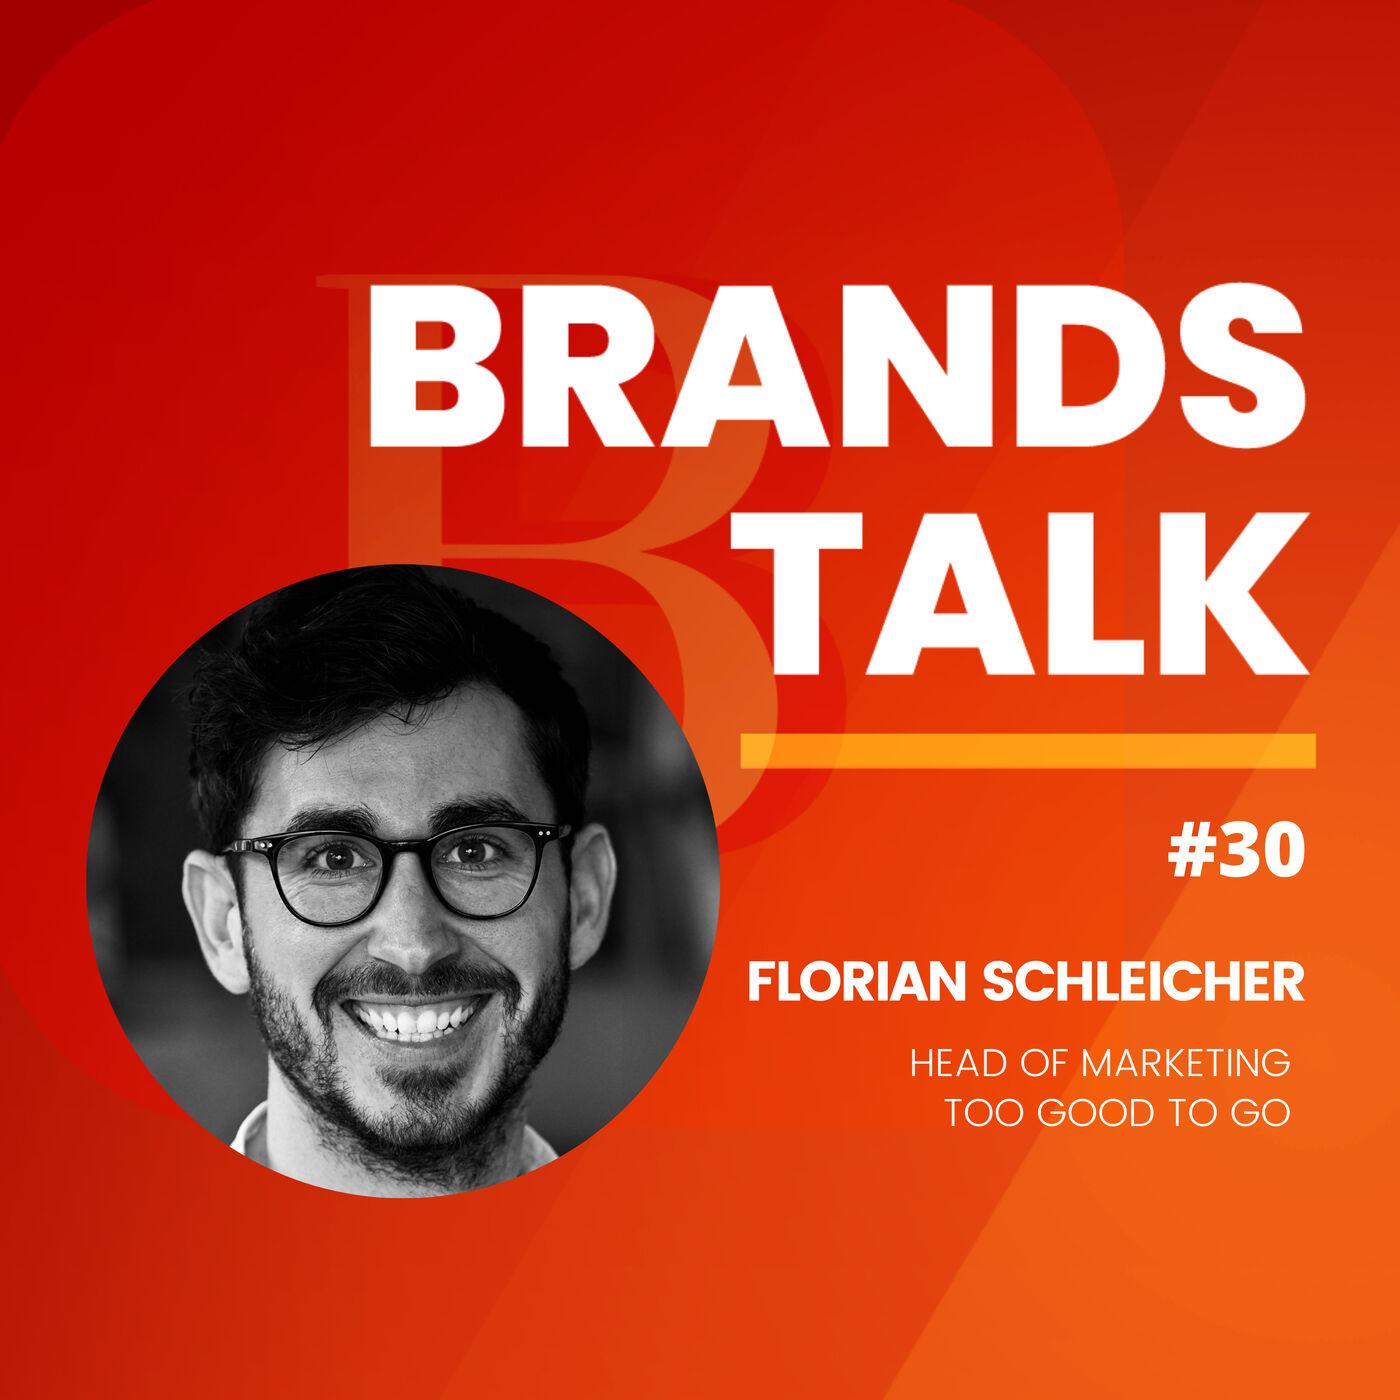 Too Good To Go - Brand Story w/Florian Schleicher